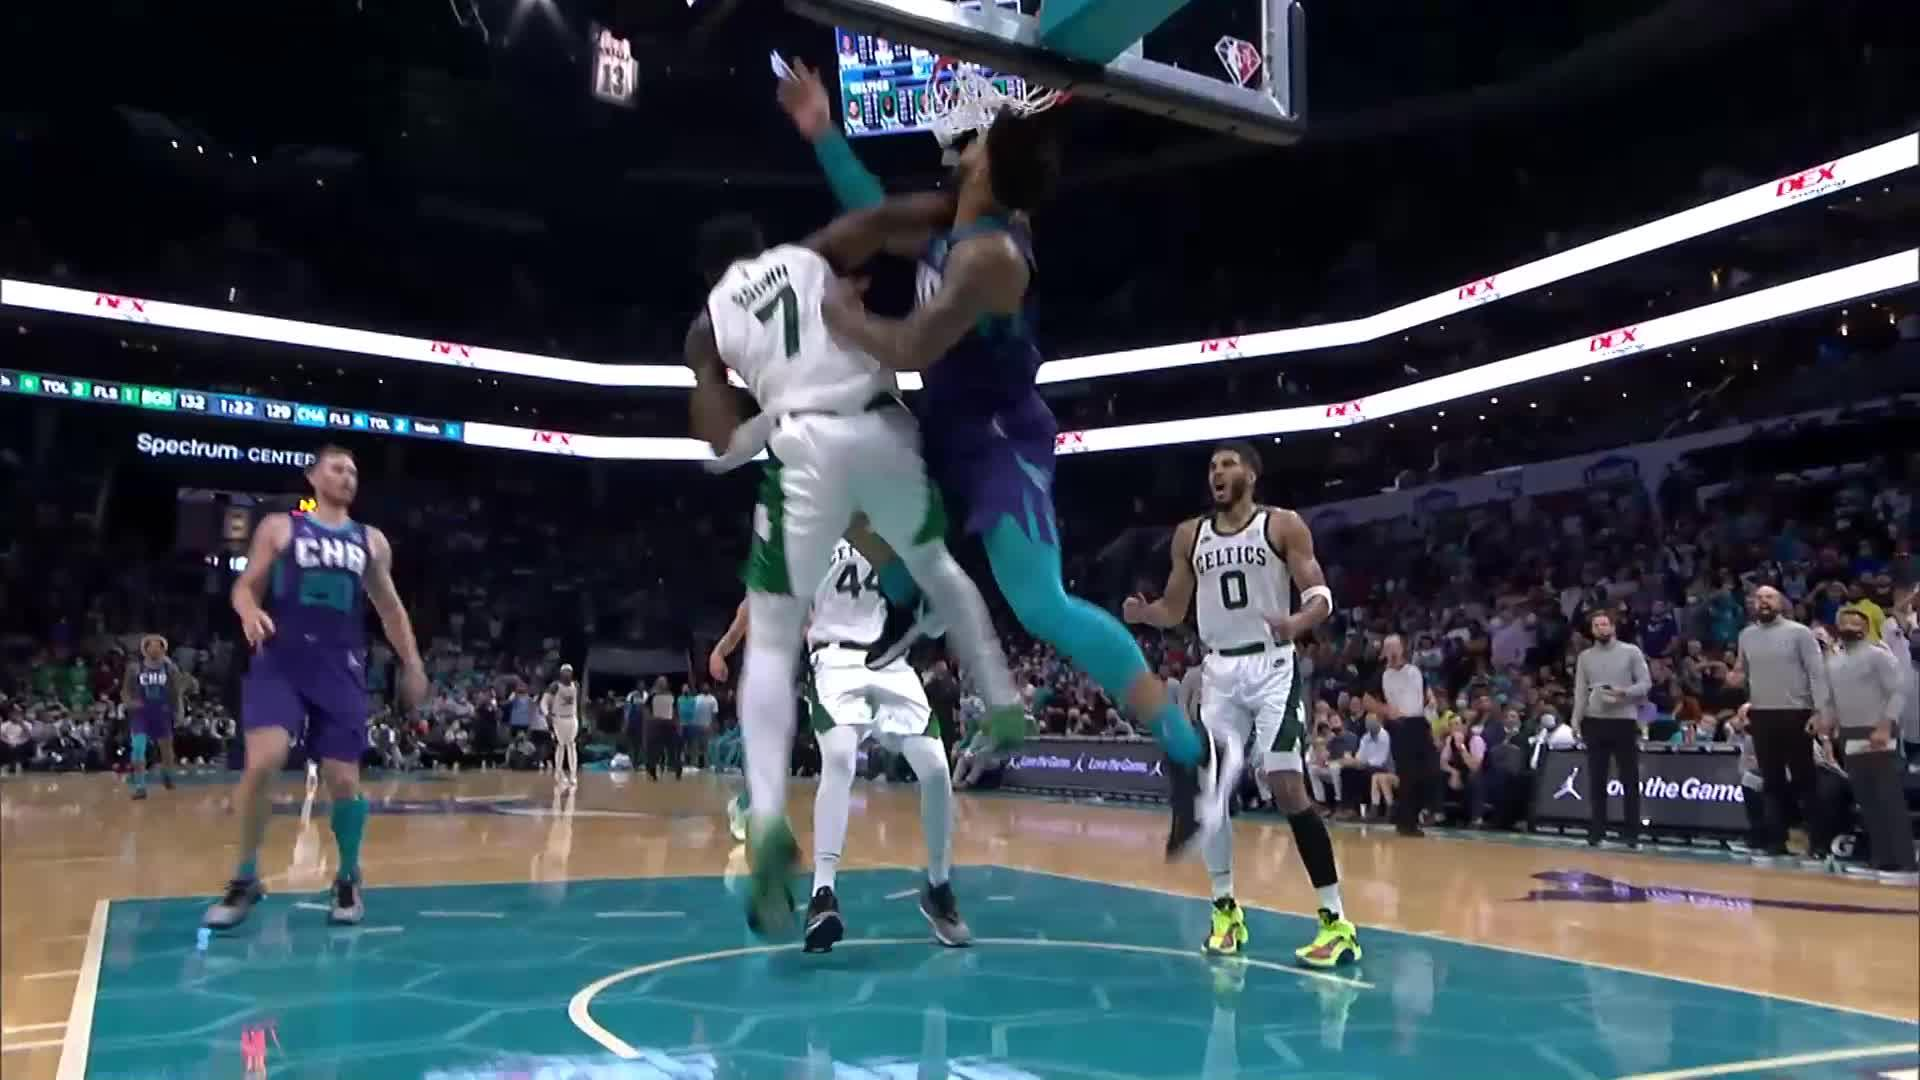 Top Plays from Charlotte Hornets vs. Boston Celtics